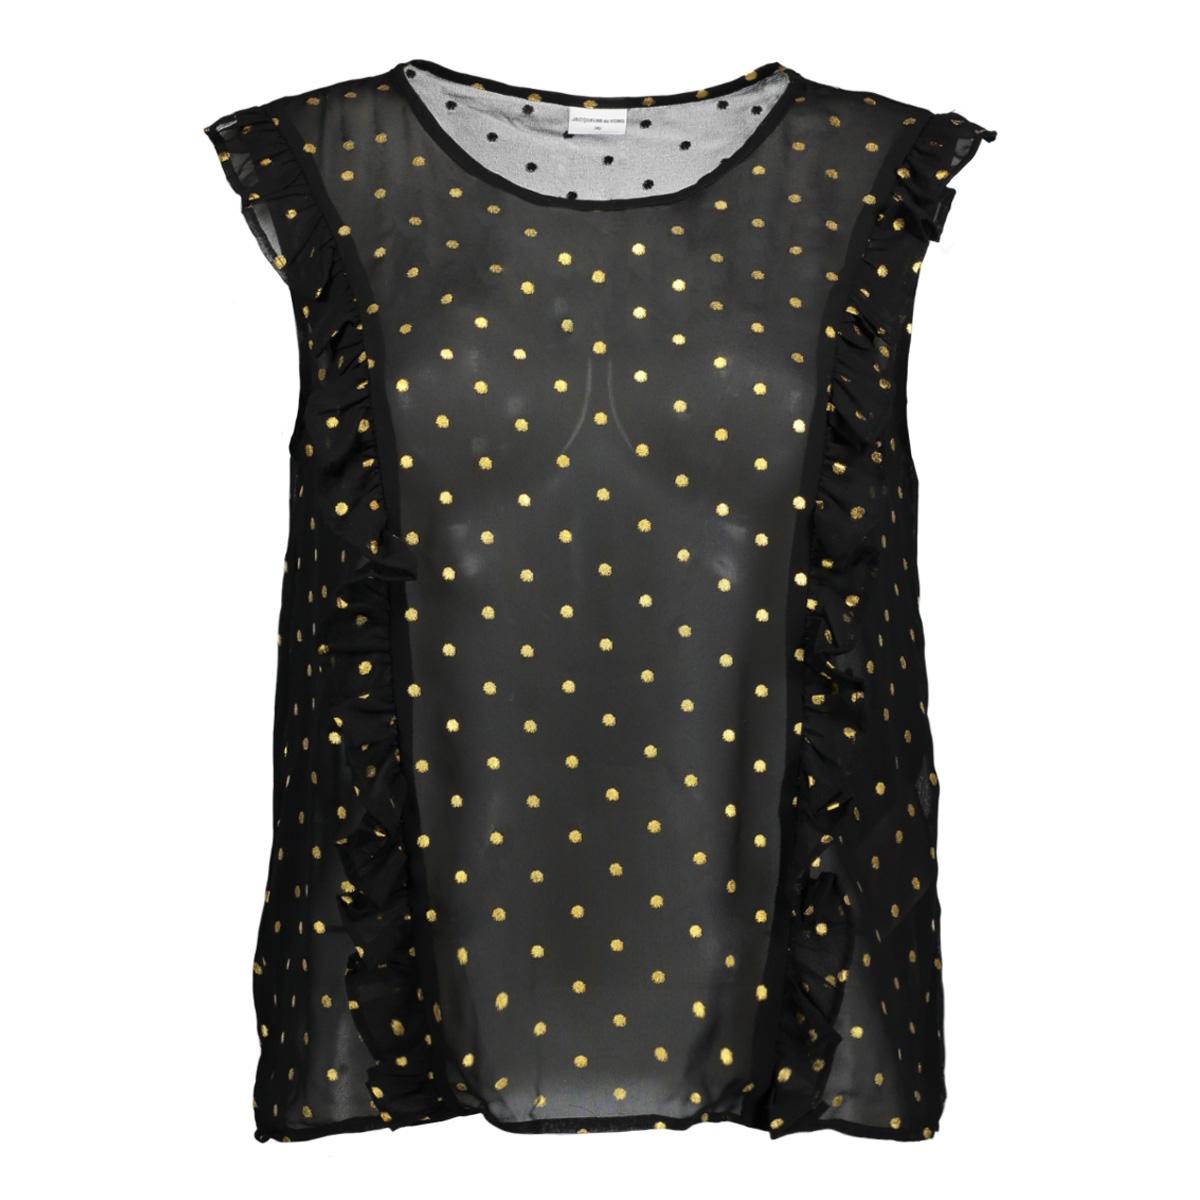 jdymissy s/l frill foil top wvn 15145524 jacqueline de yong top black/gold dot